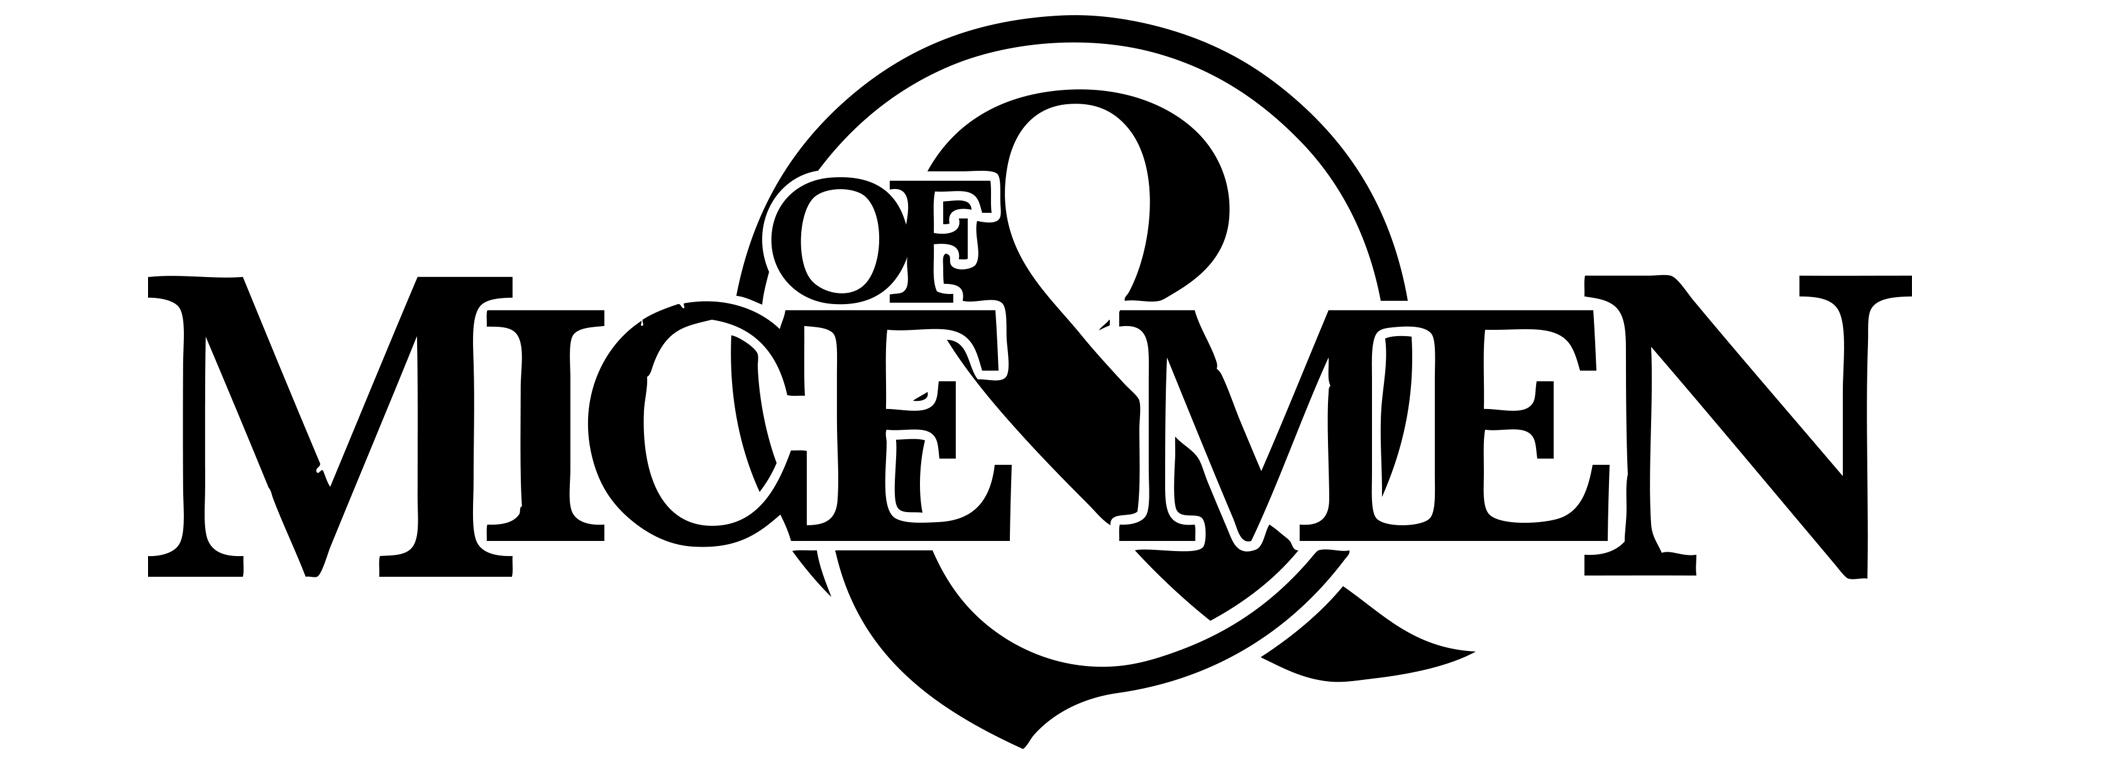 File:Of mice & men logo.jpg.